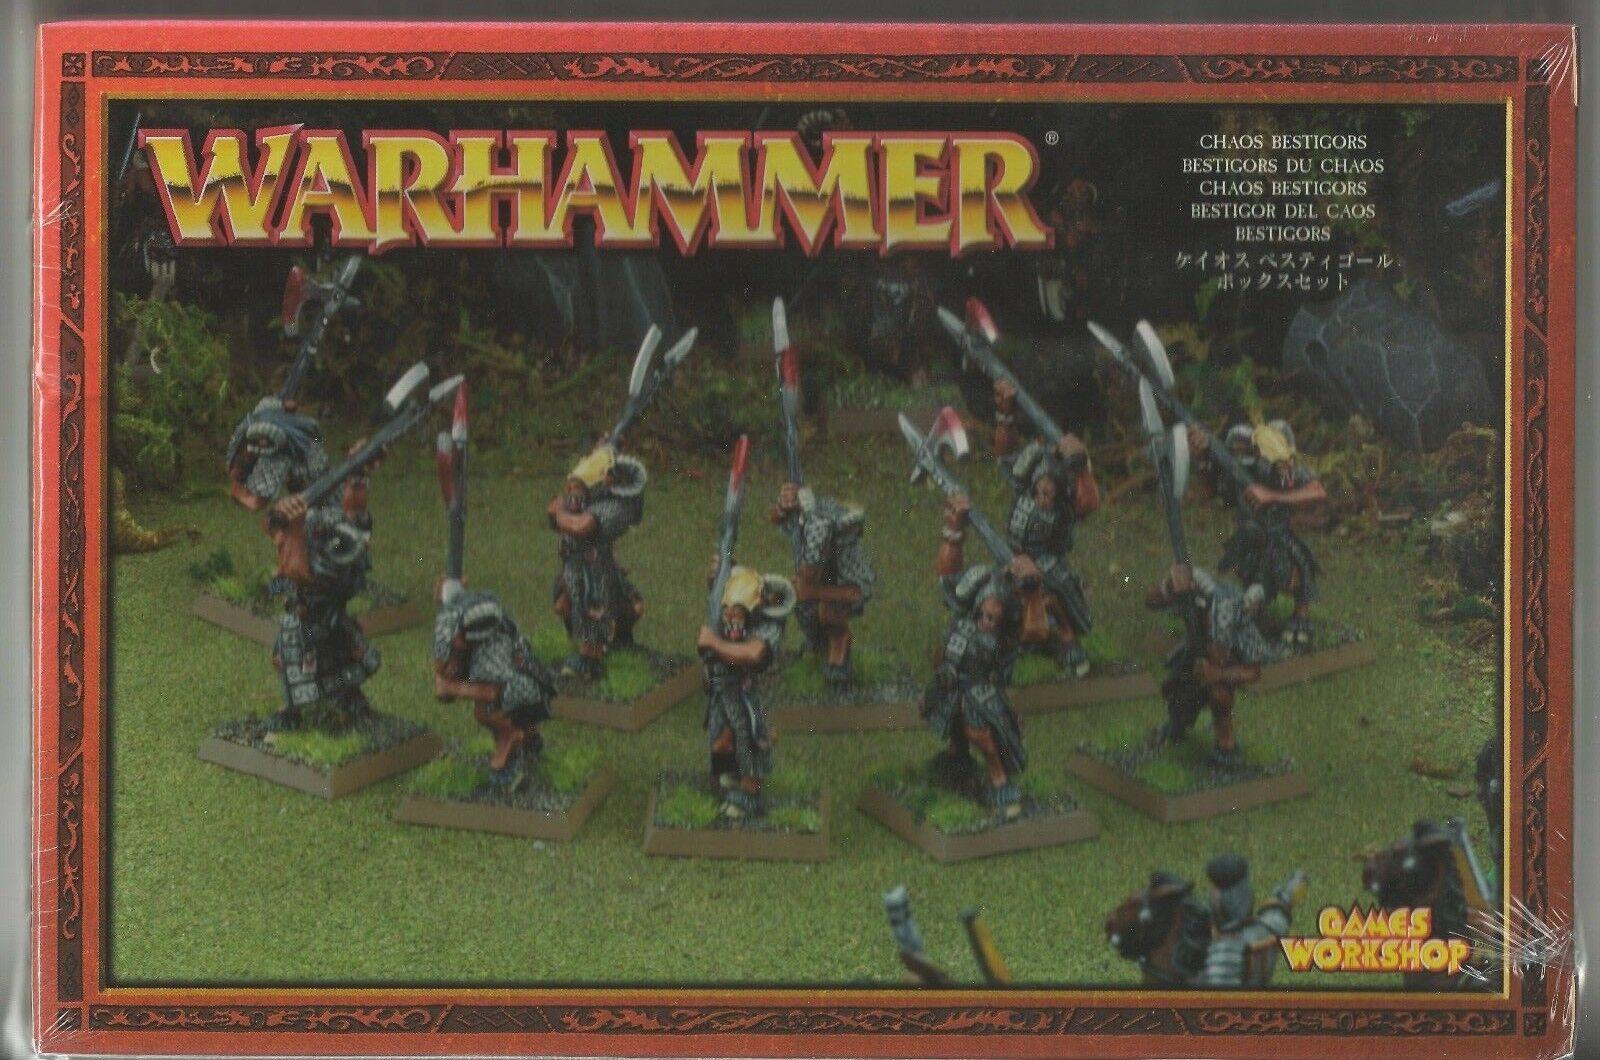 GW Warhammer Chaos bästigors 81 -14 (10 -modellllerler) -METAL SEALD låda RARE